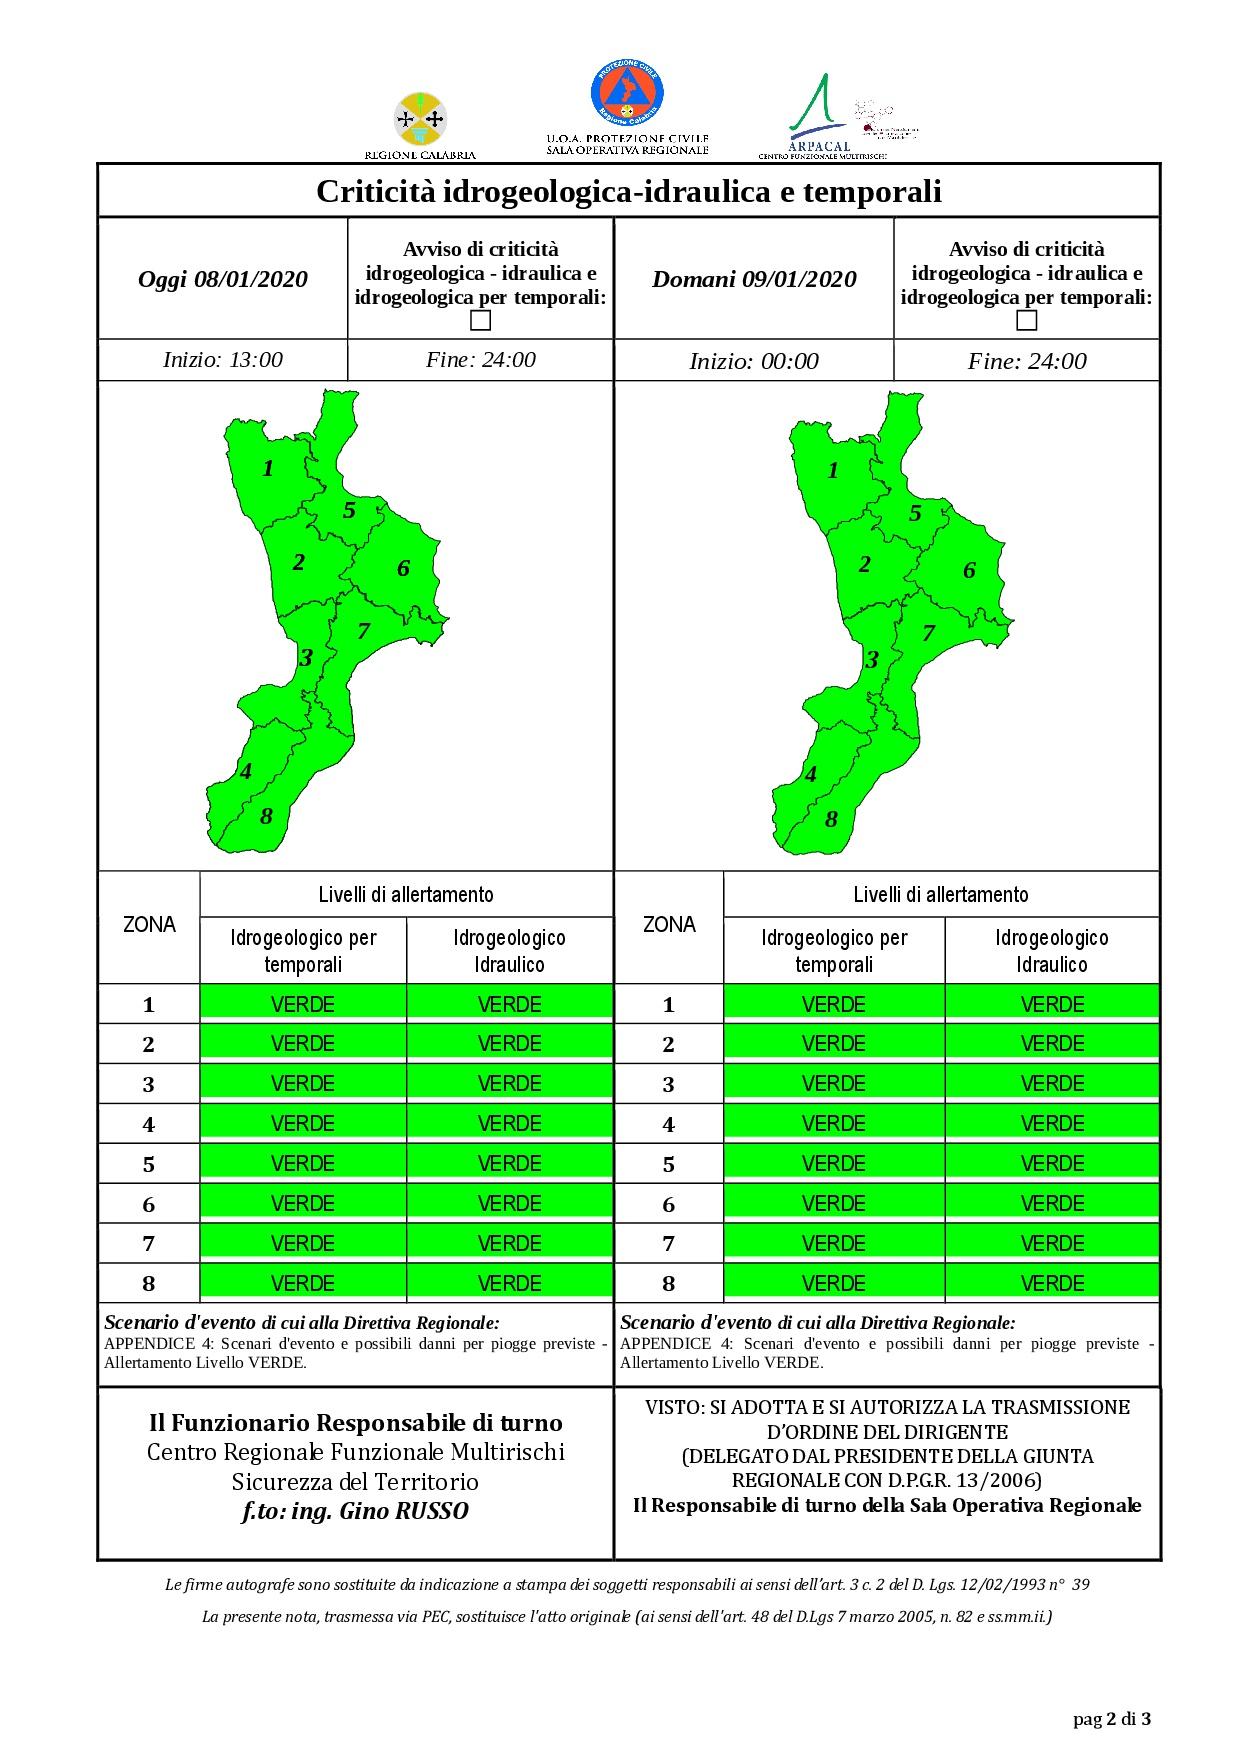 Criticità idrogeologica-idraulica e temporali in Calabria 08-01-2020